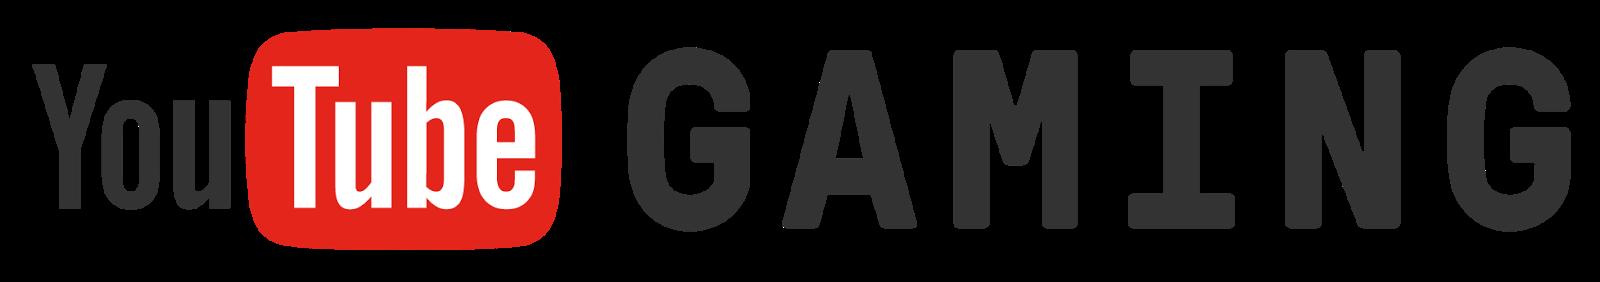 youtube gaming - 1600×282